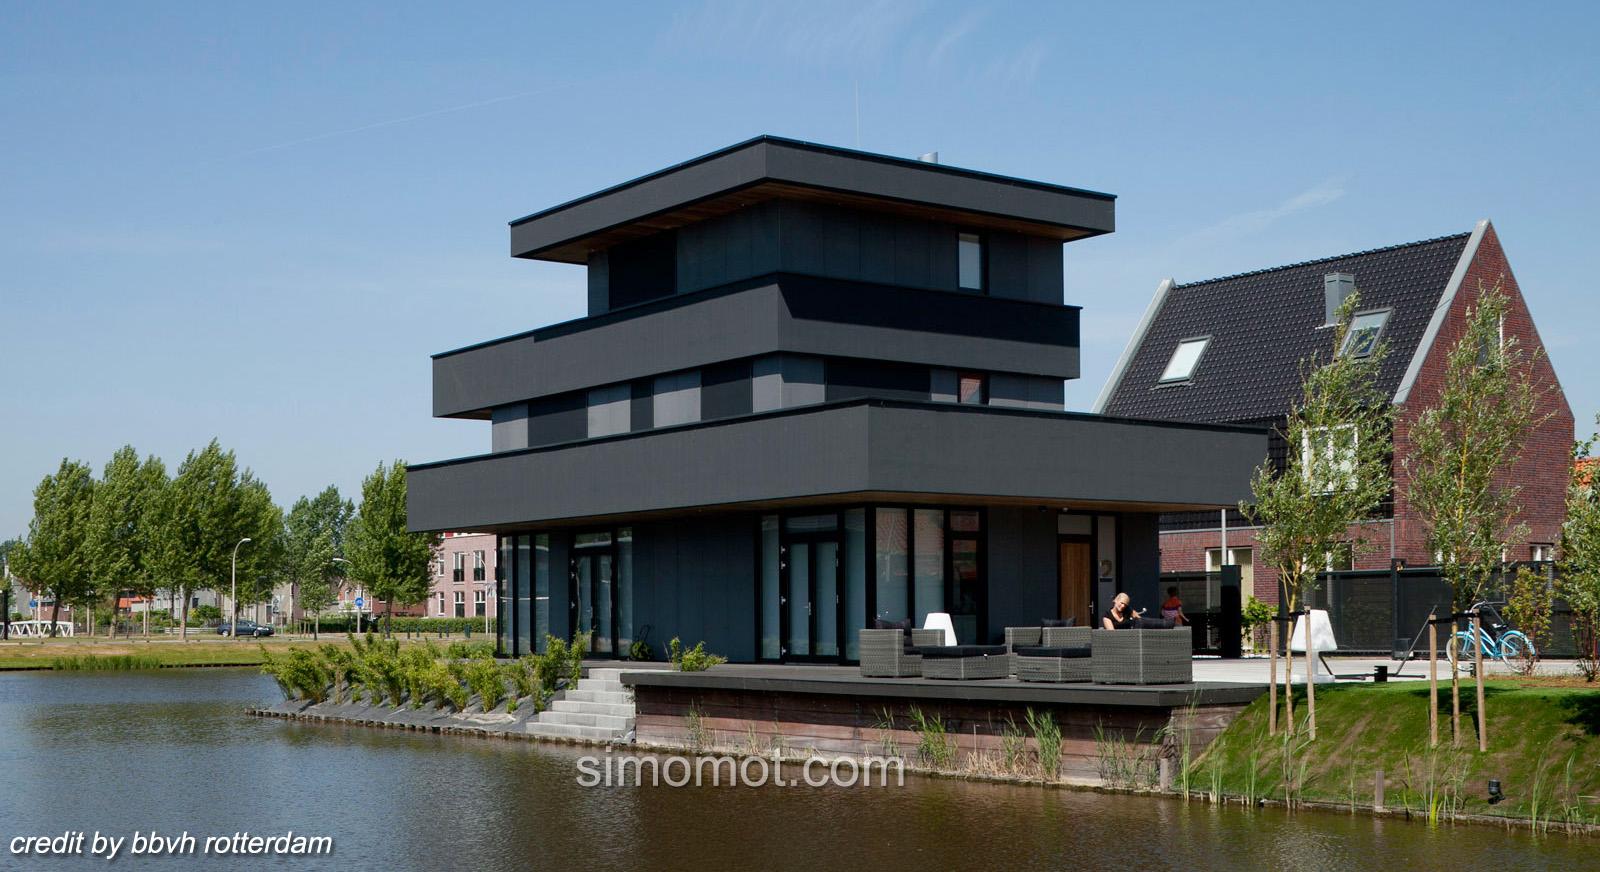 Mantab Benar Desain Arsitektur Rumah Di Tepi Sungai Ala Ypenburg III